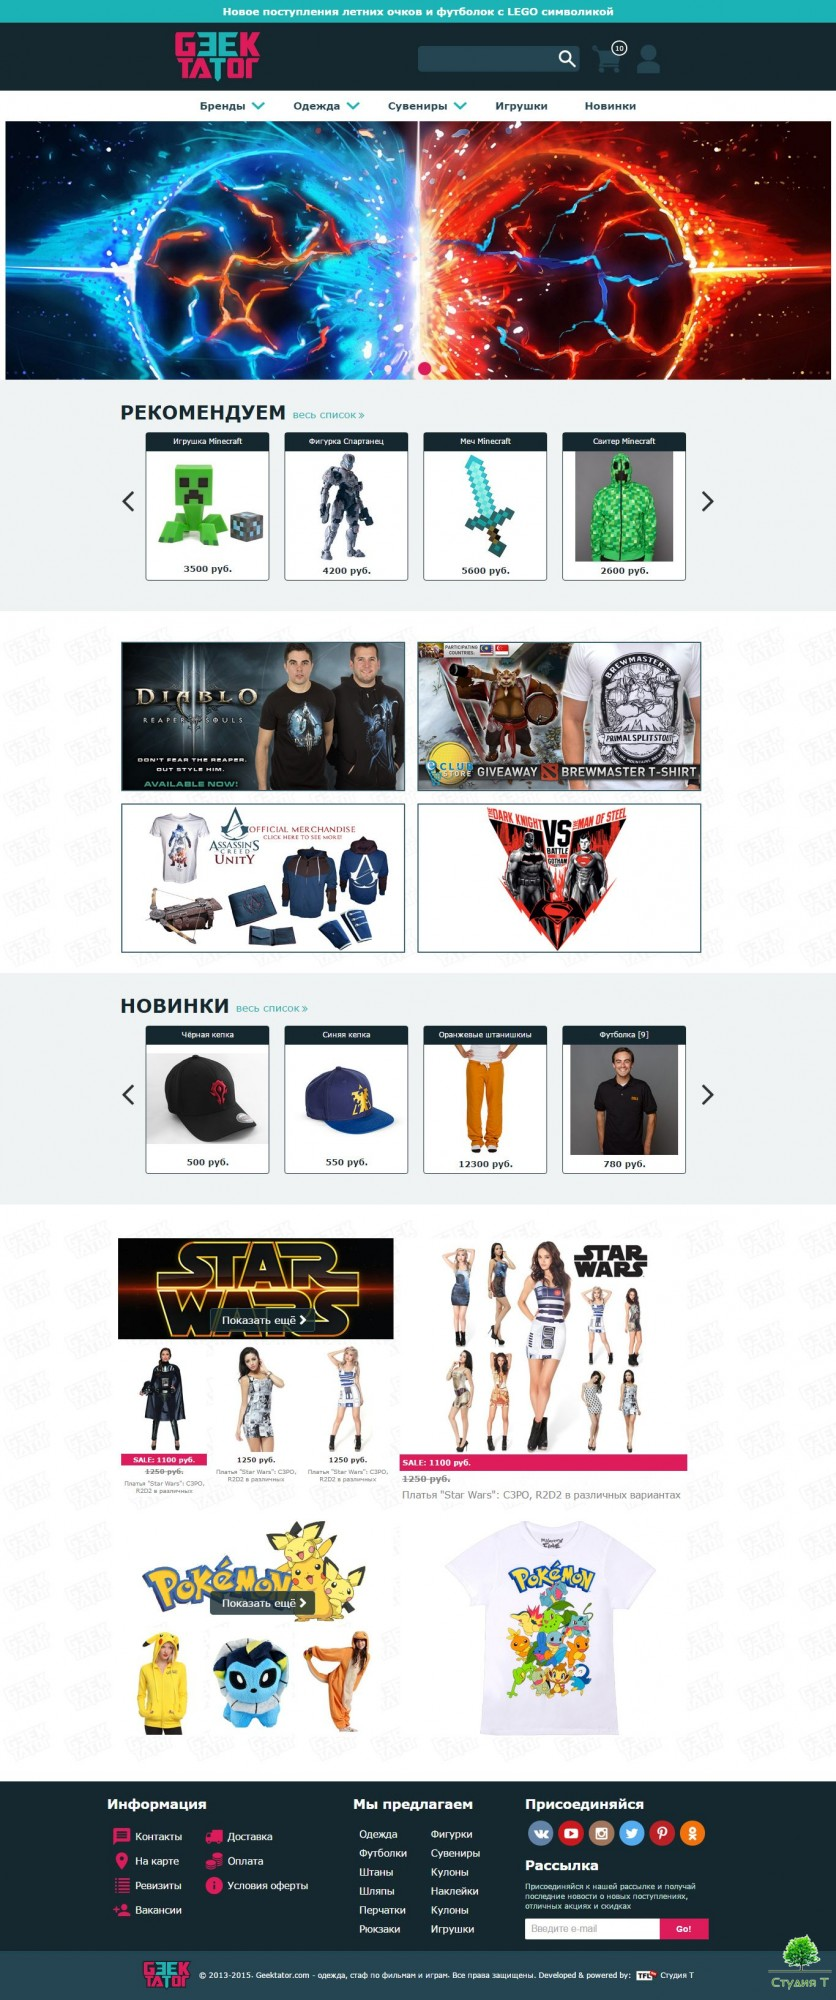 Geektator - концепт веб-сайта